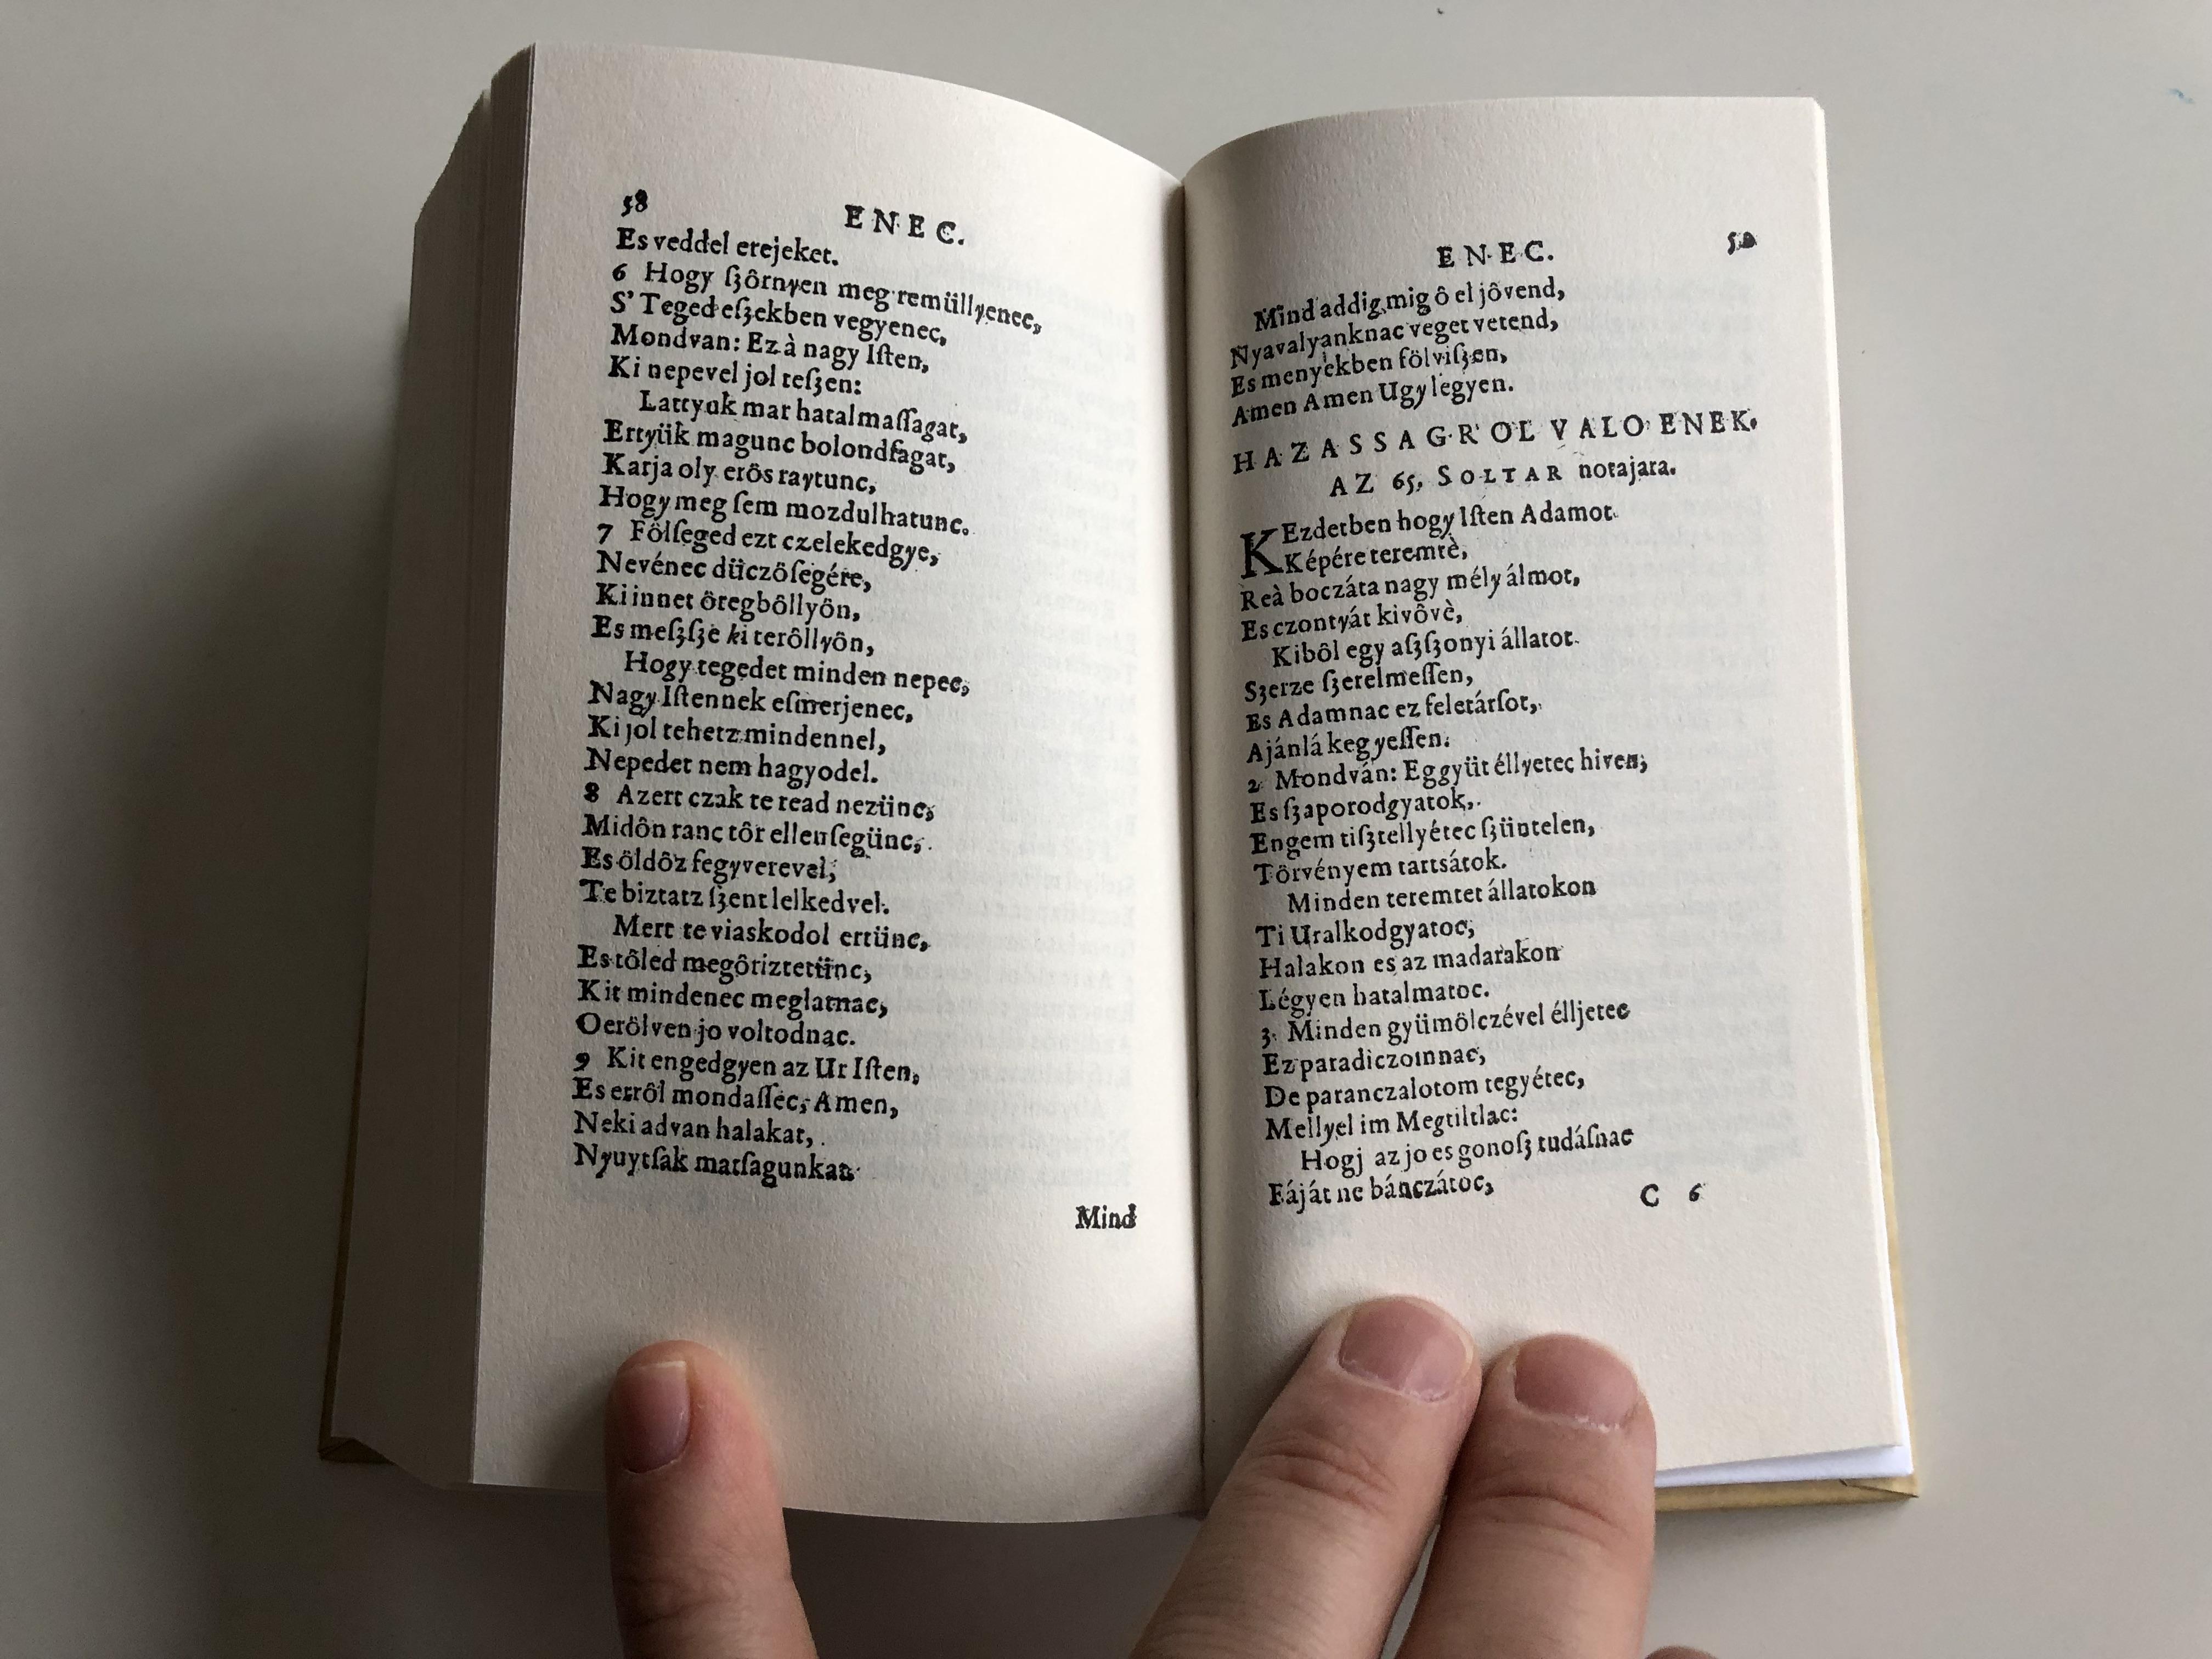 psalterium-ungaricum-kis-katekizmus-by-szenci-moln-r-albert-hungarian-psalmbook-translated-by-albert-moln-r-szenci-herborn-1607herbona-md.-cvii.-11-.jpg